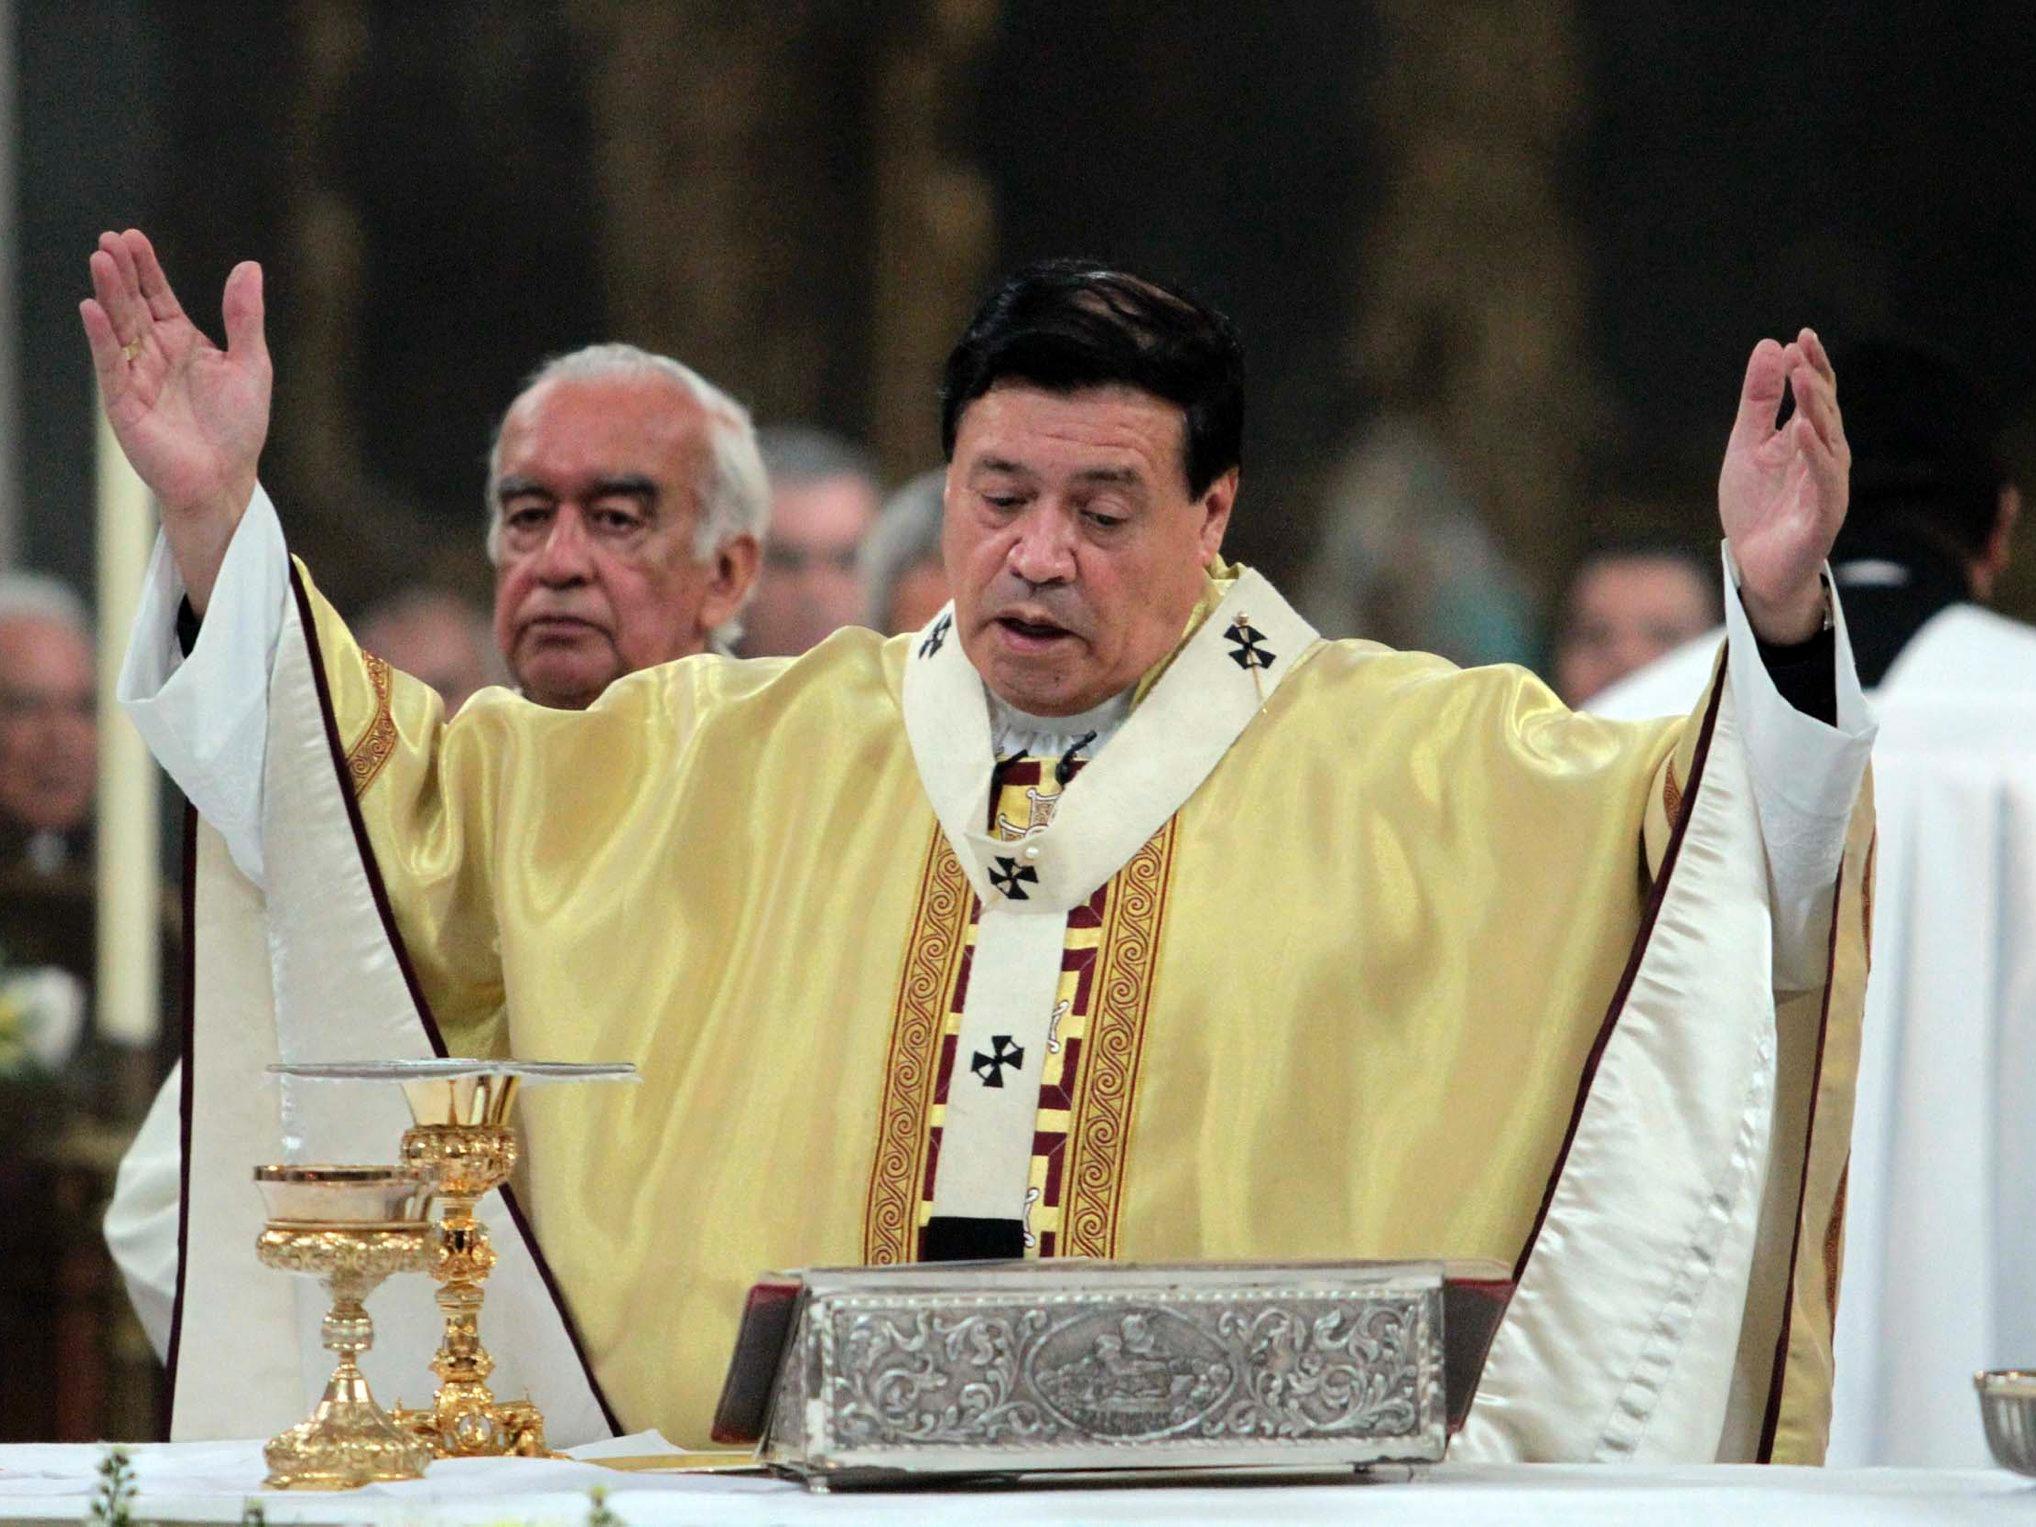 Cardenal Norberto Rivera celebra misa por la paz en Irak